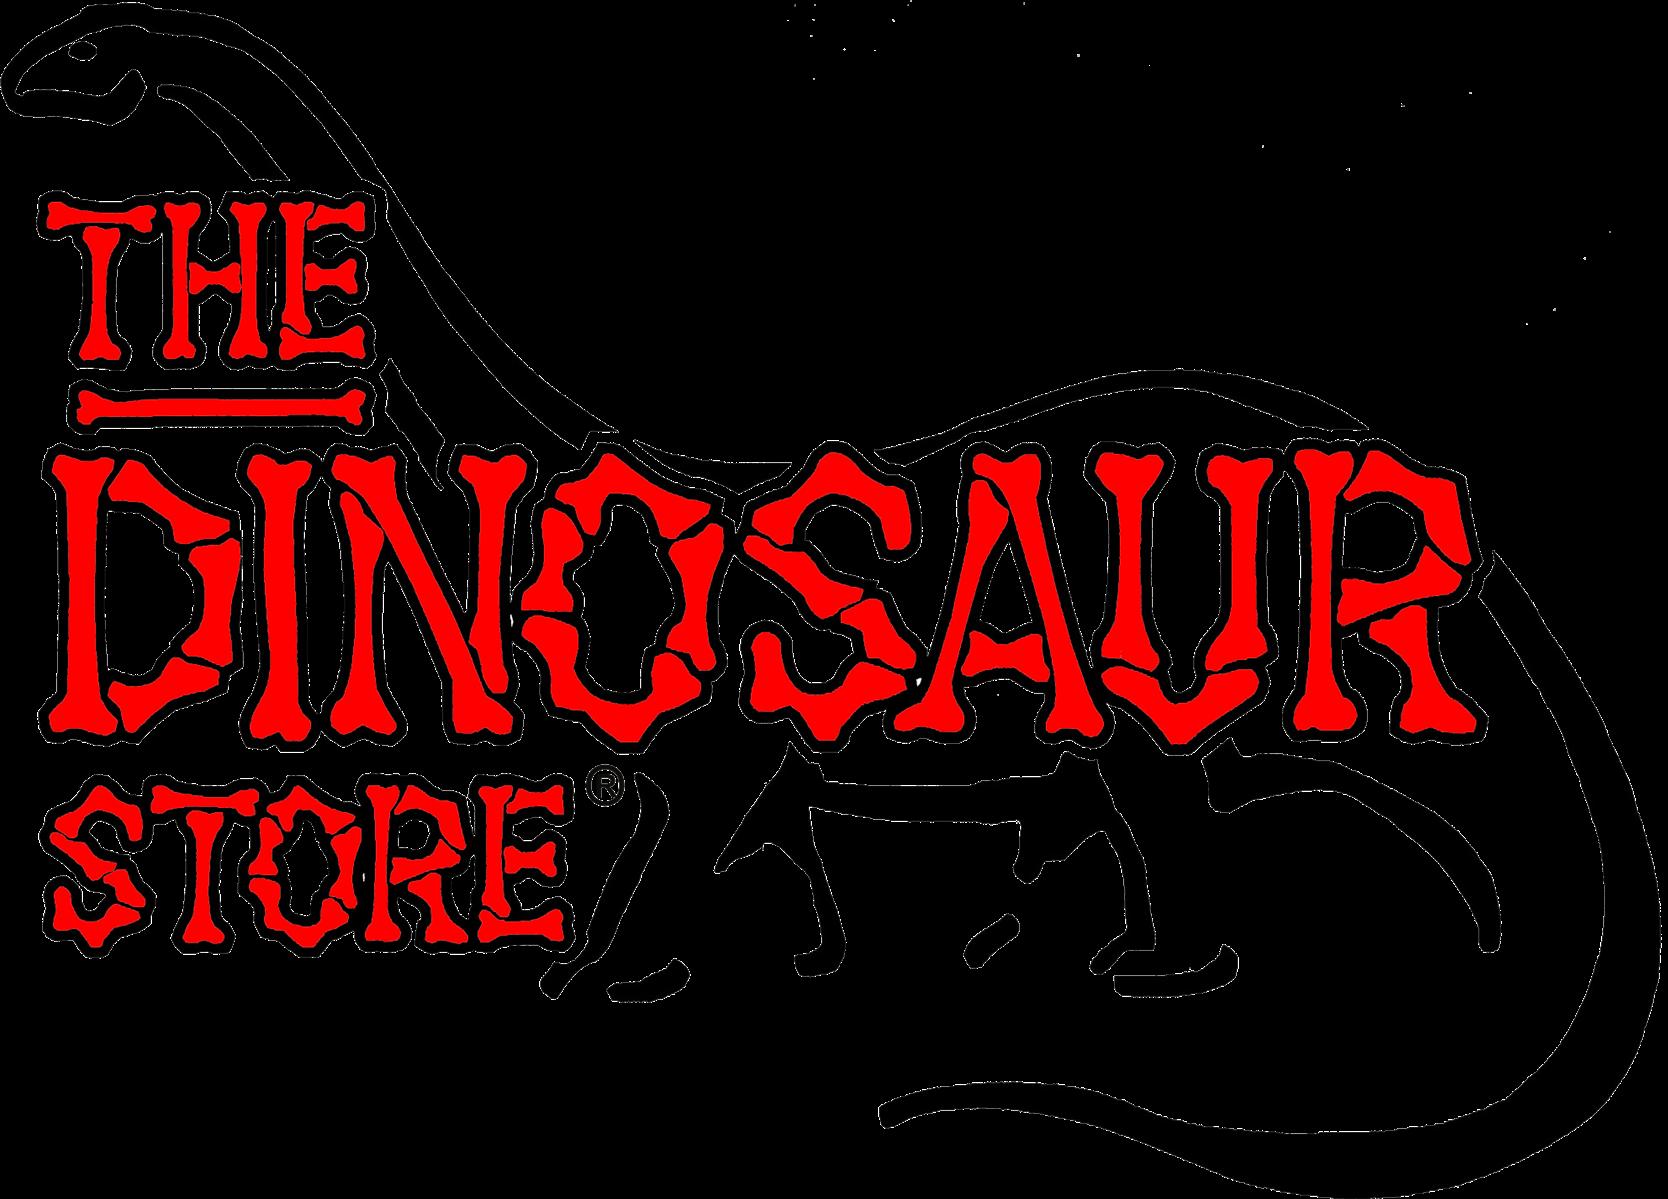 The Dinosaur Store